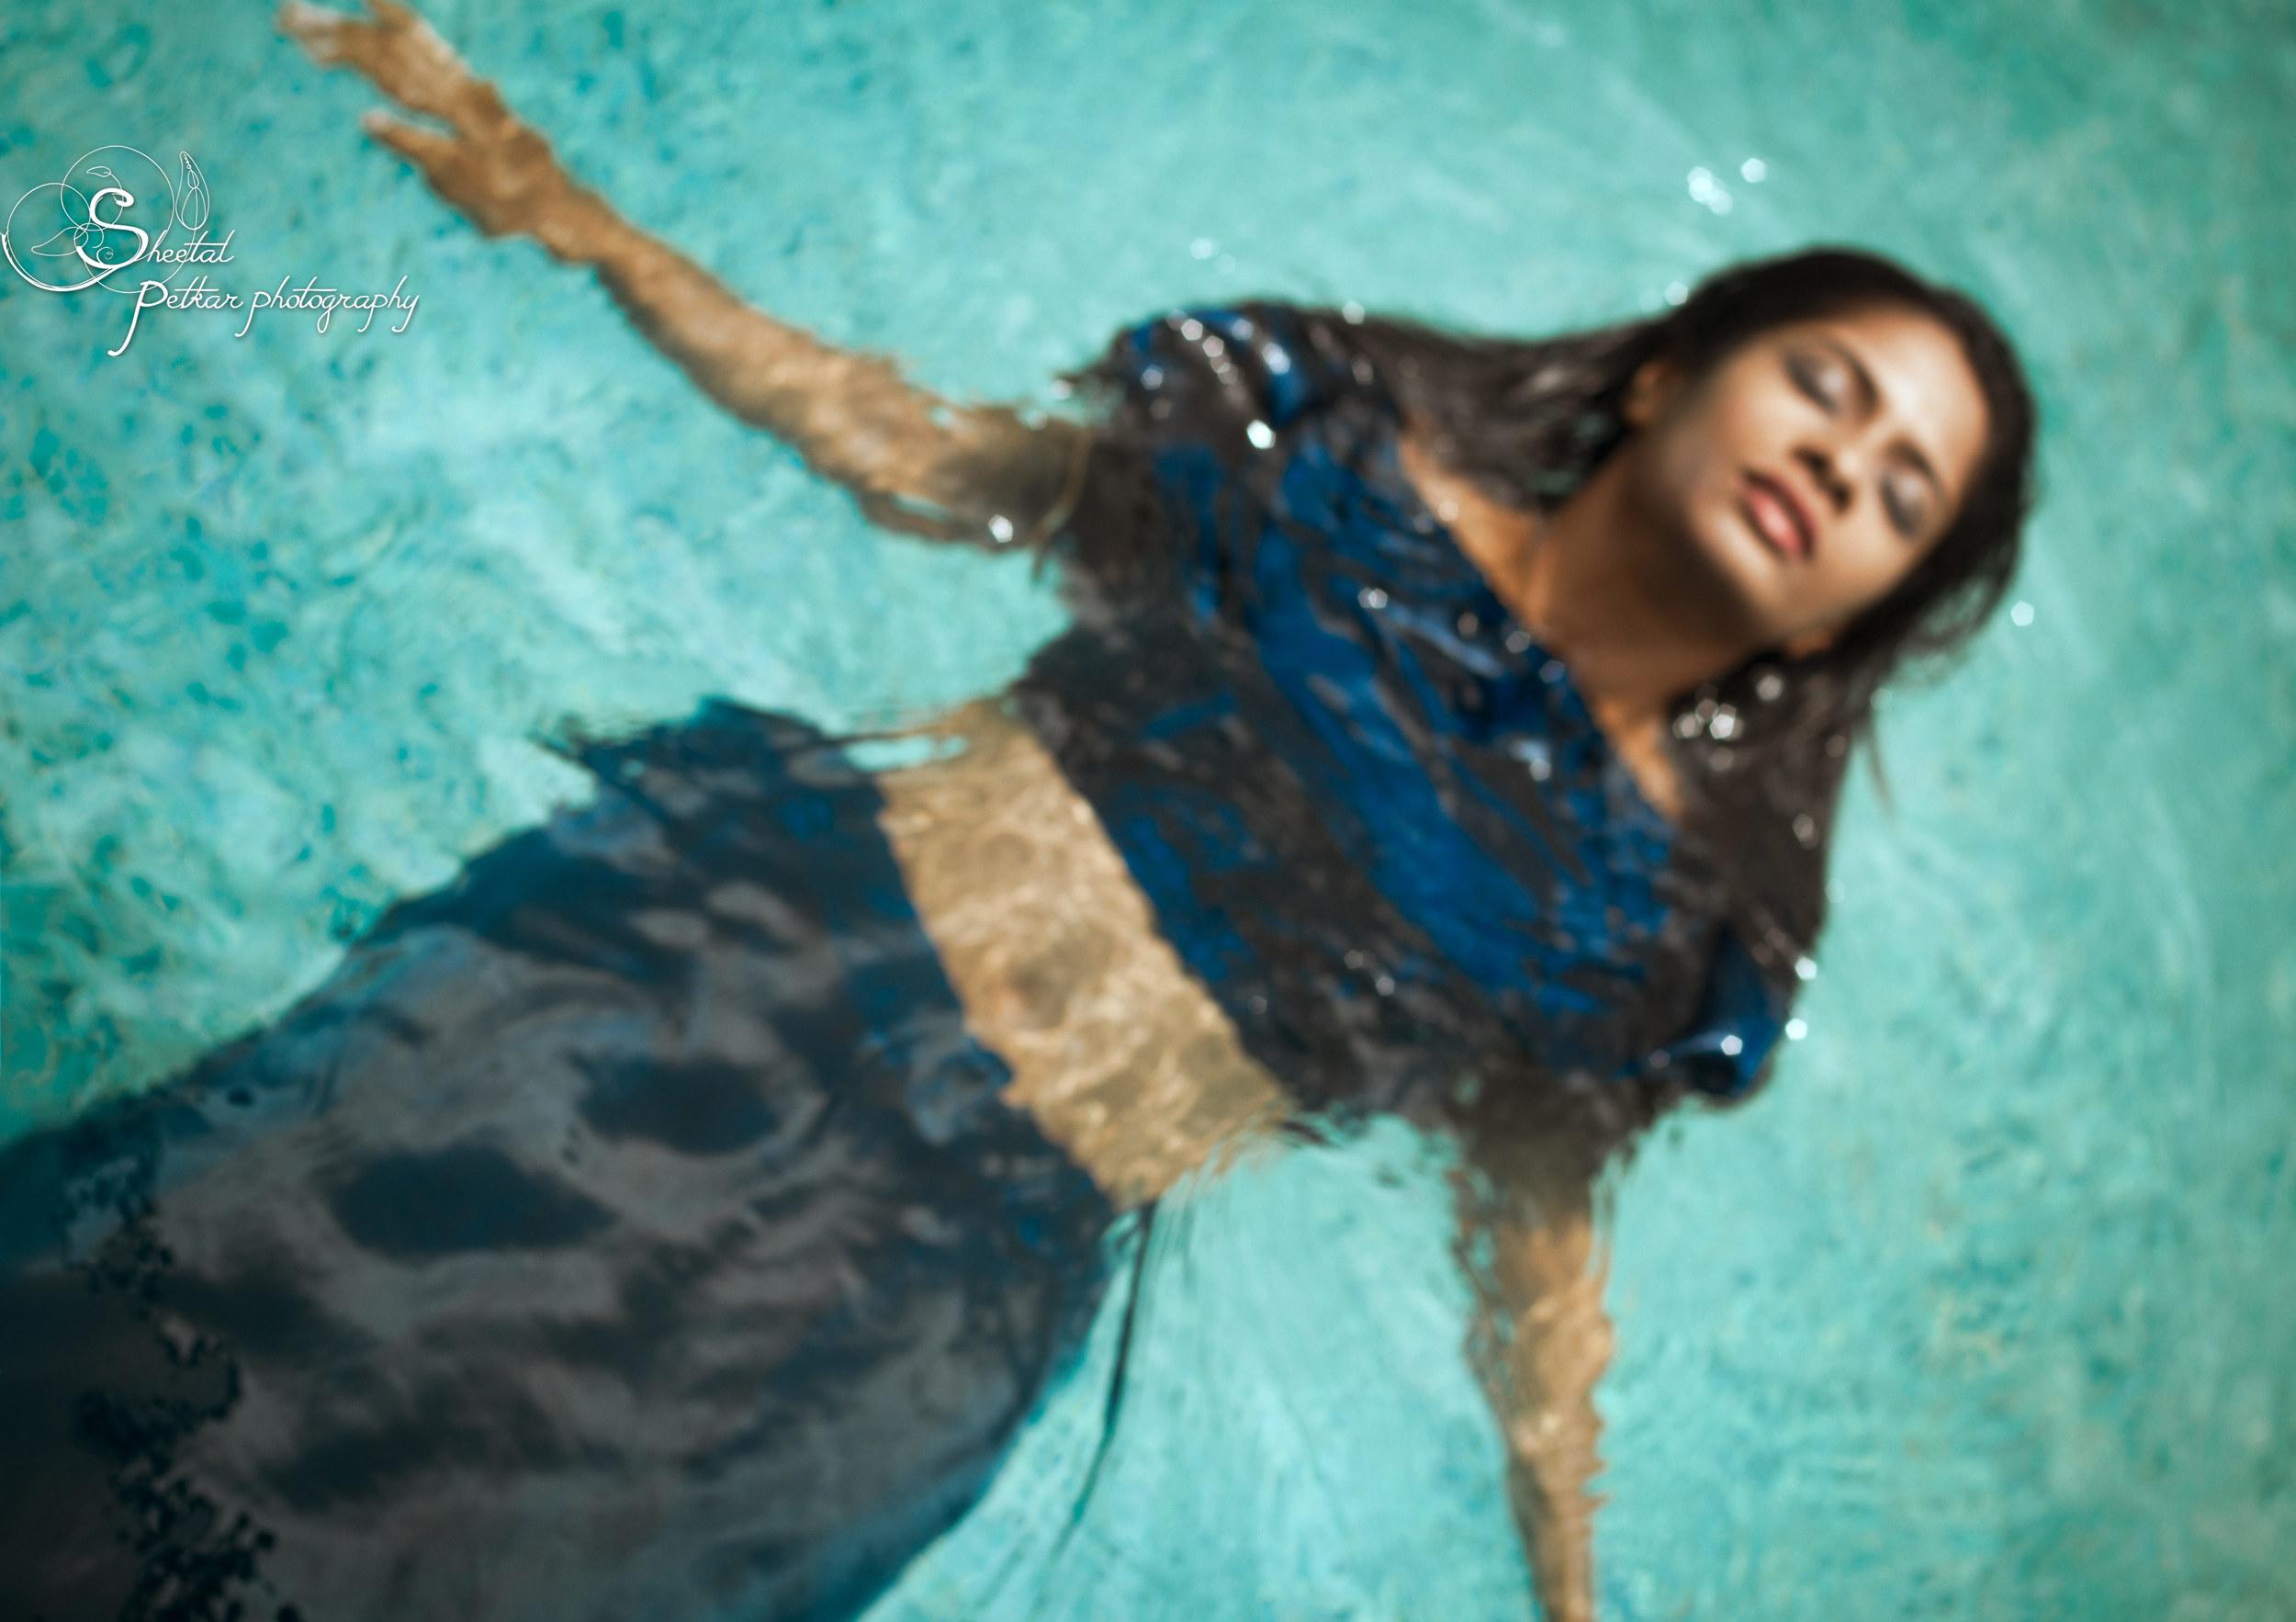 girl_in_blue_floating_on_water.jpg